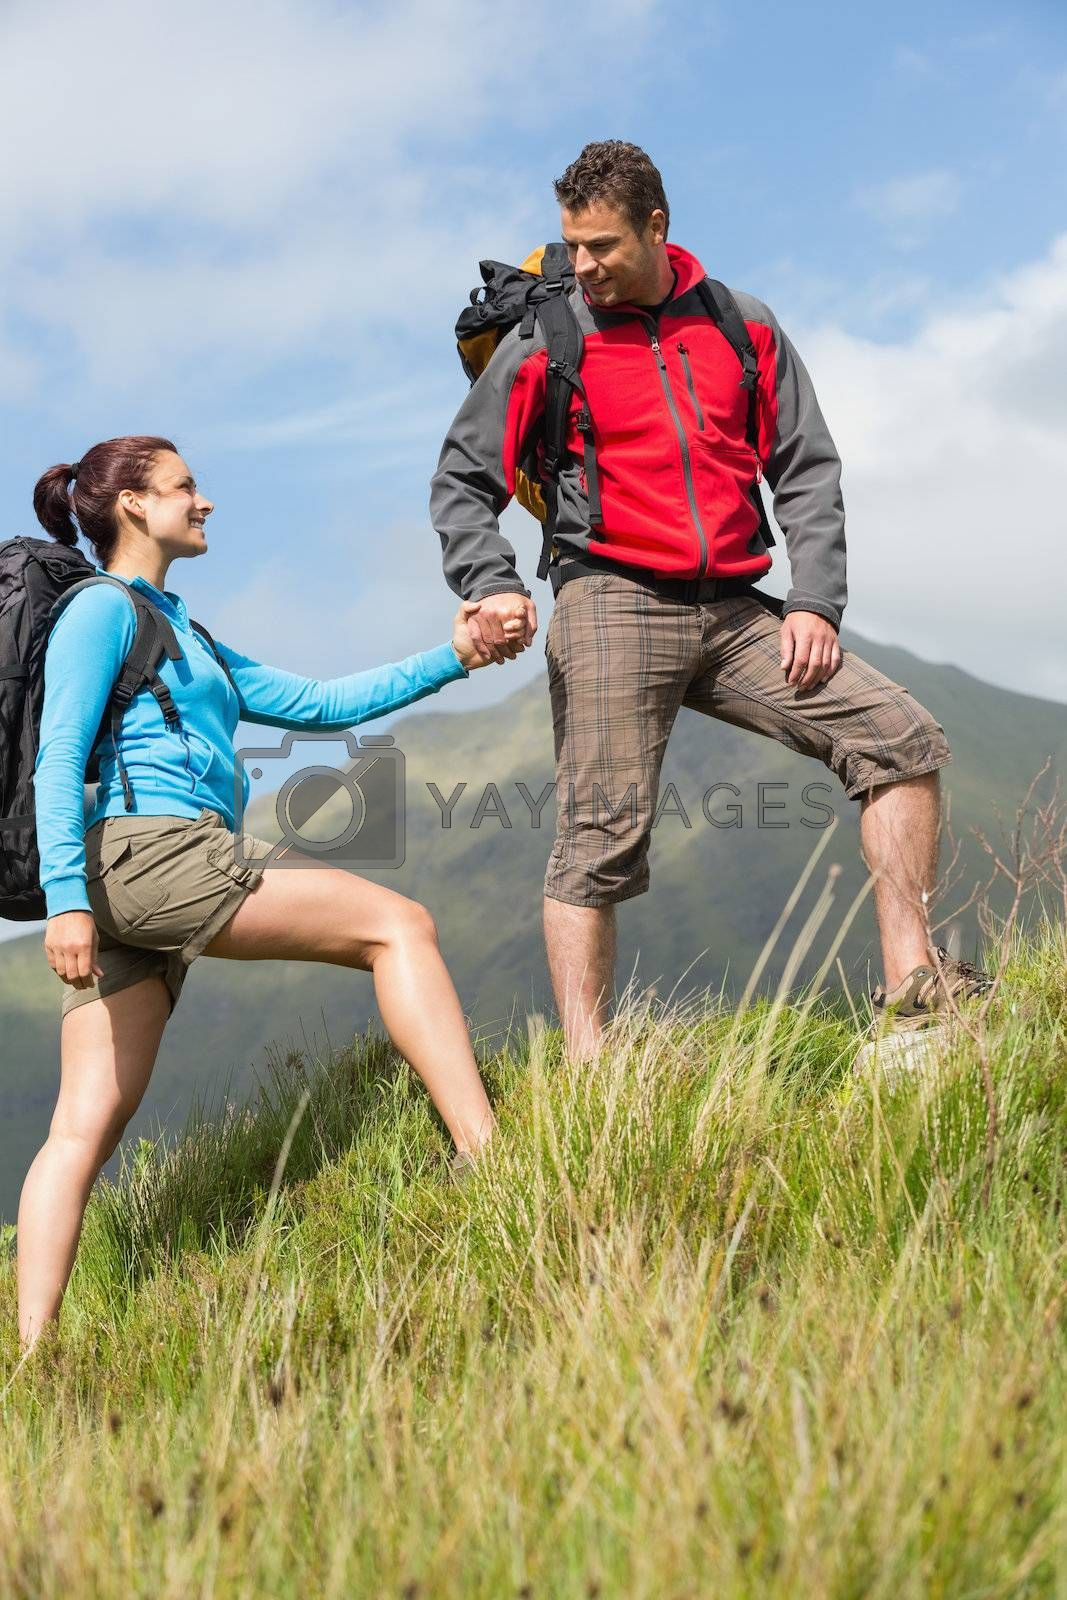 Handsome hiker helping his girlfriend uphill by Wavebreakmedia